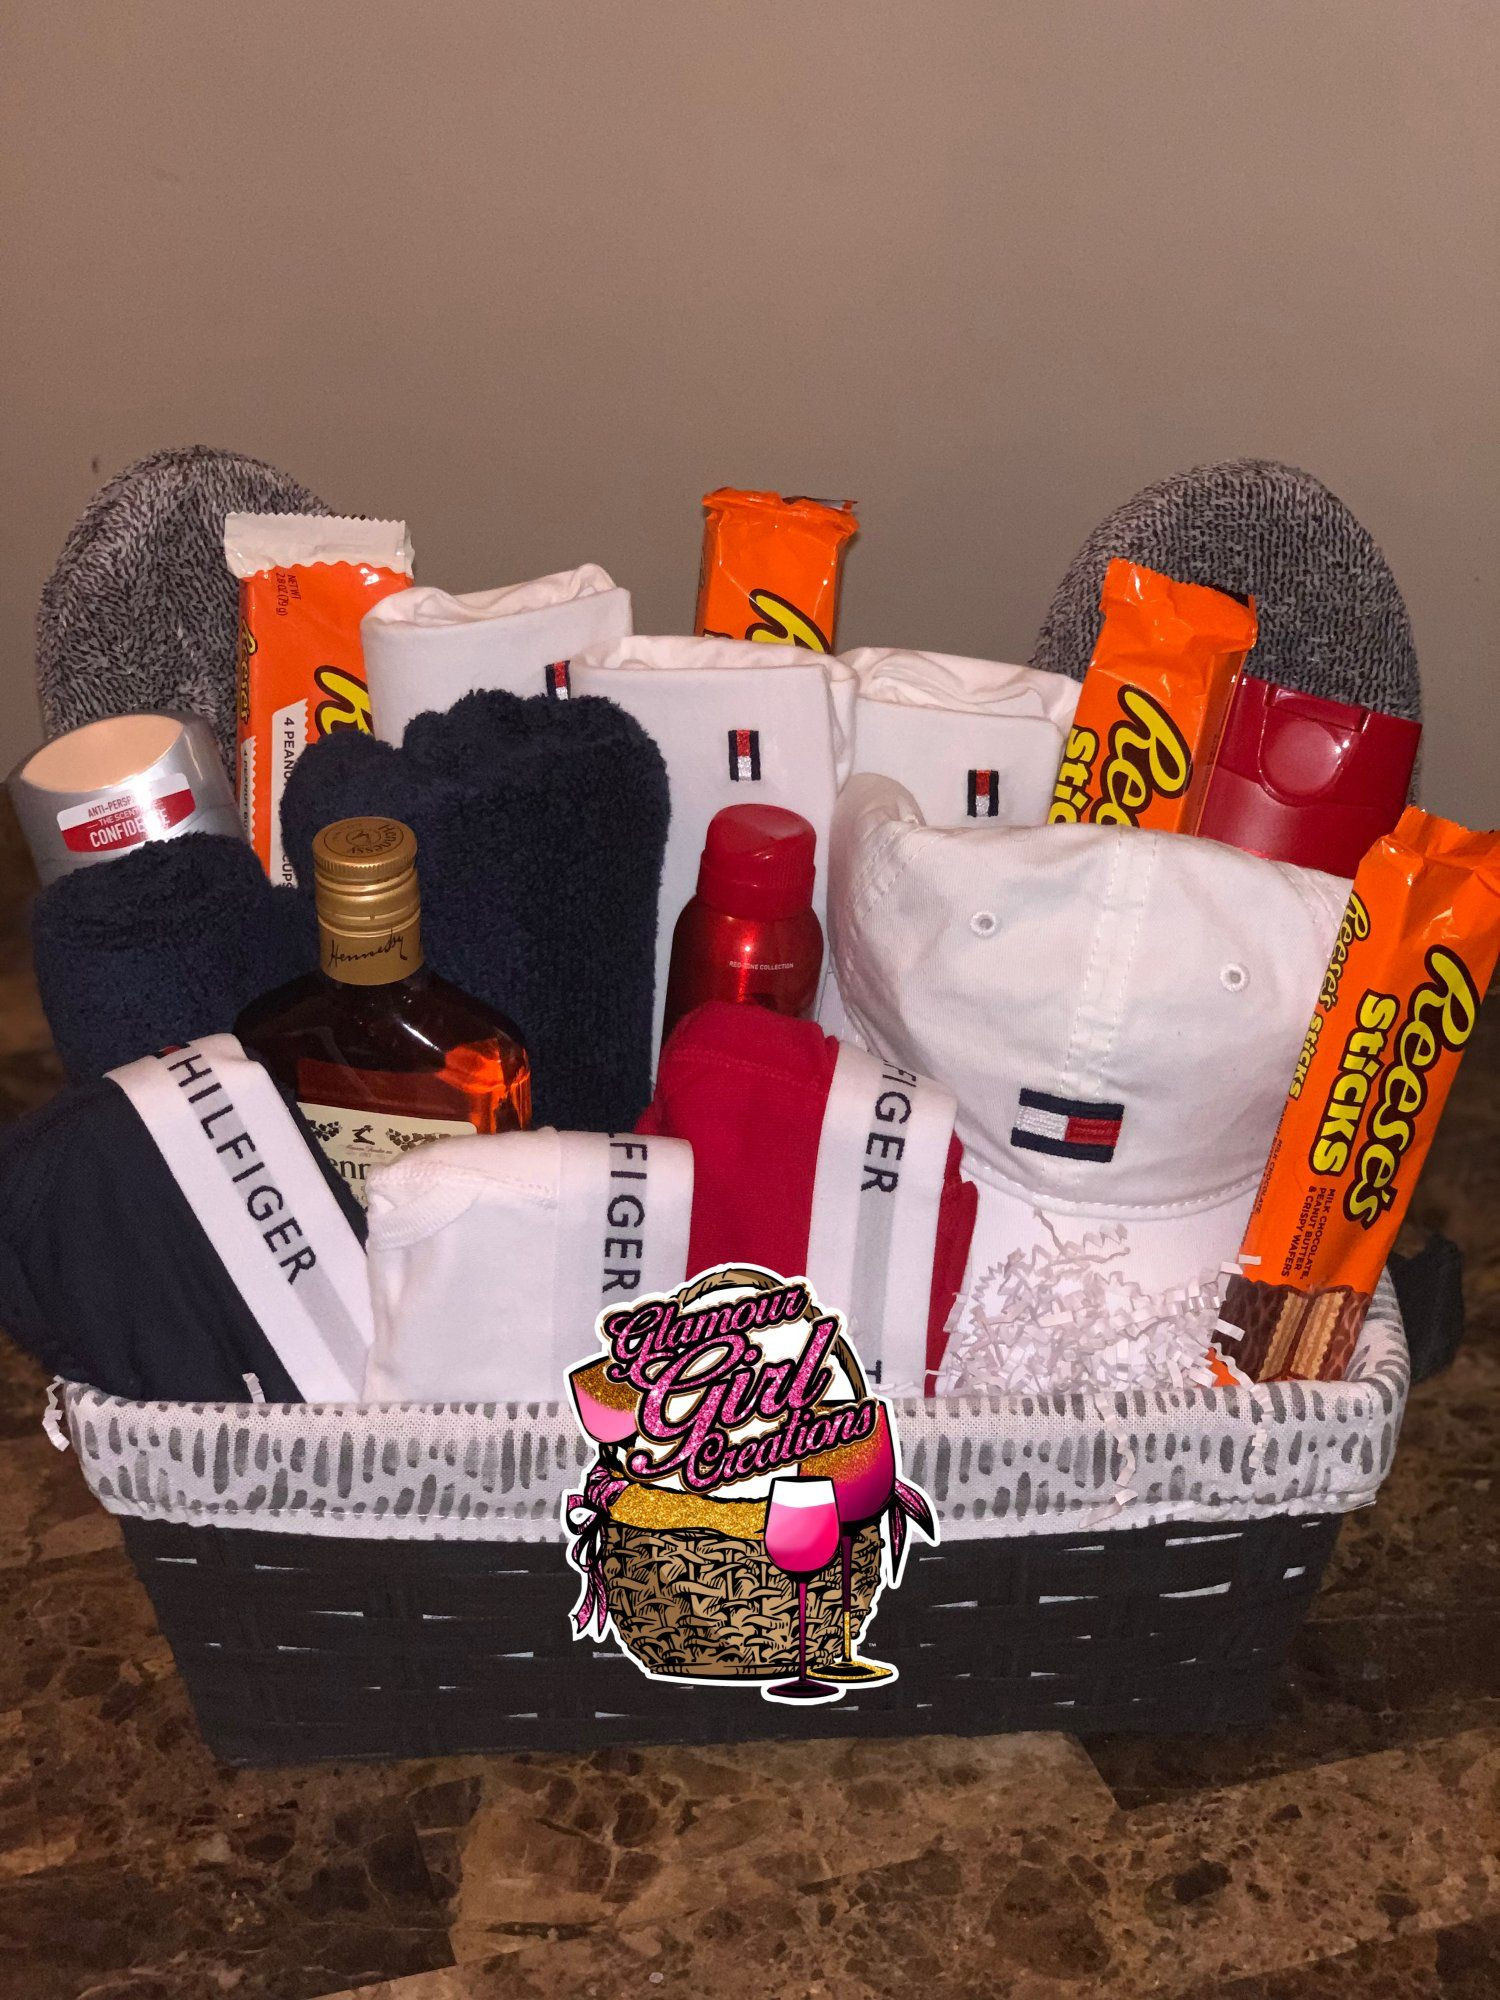 Best ideas about DIY Gift Basket For Him . Save or Pin Tommy Hilfiger basket Tommy hilfiger Now.